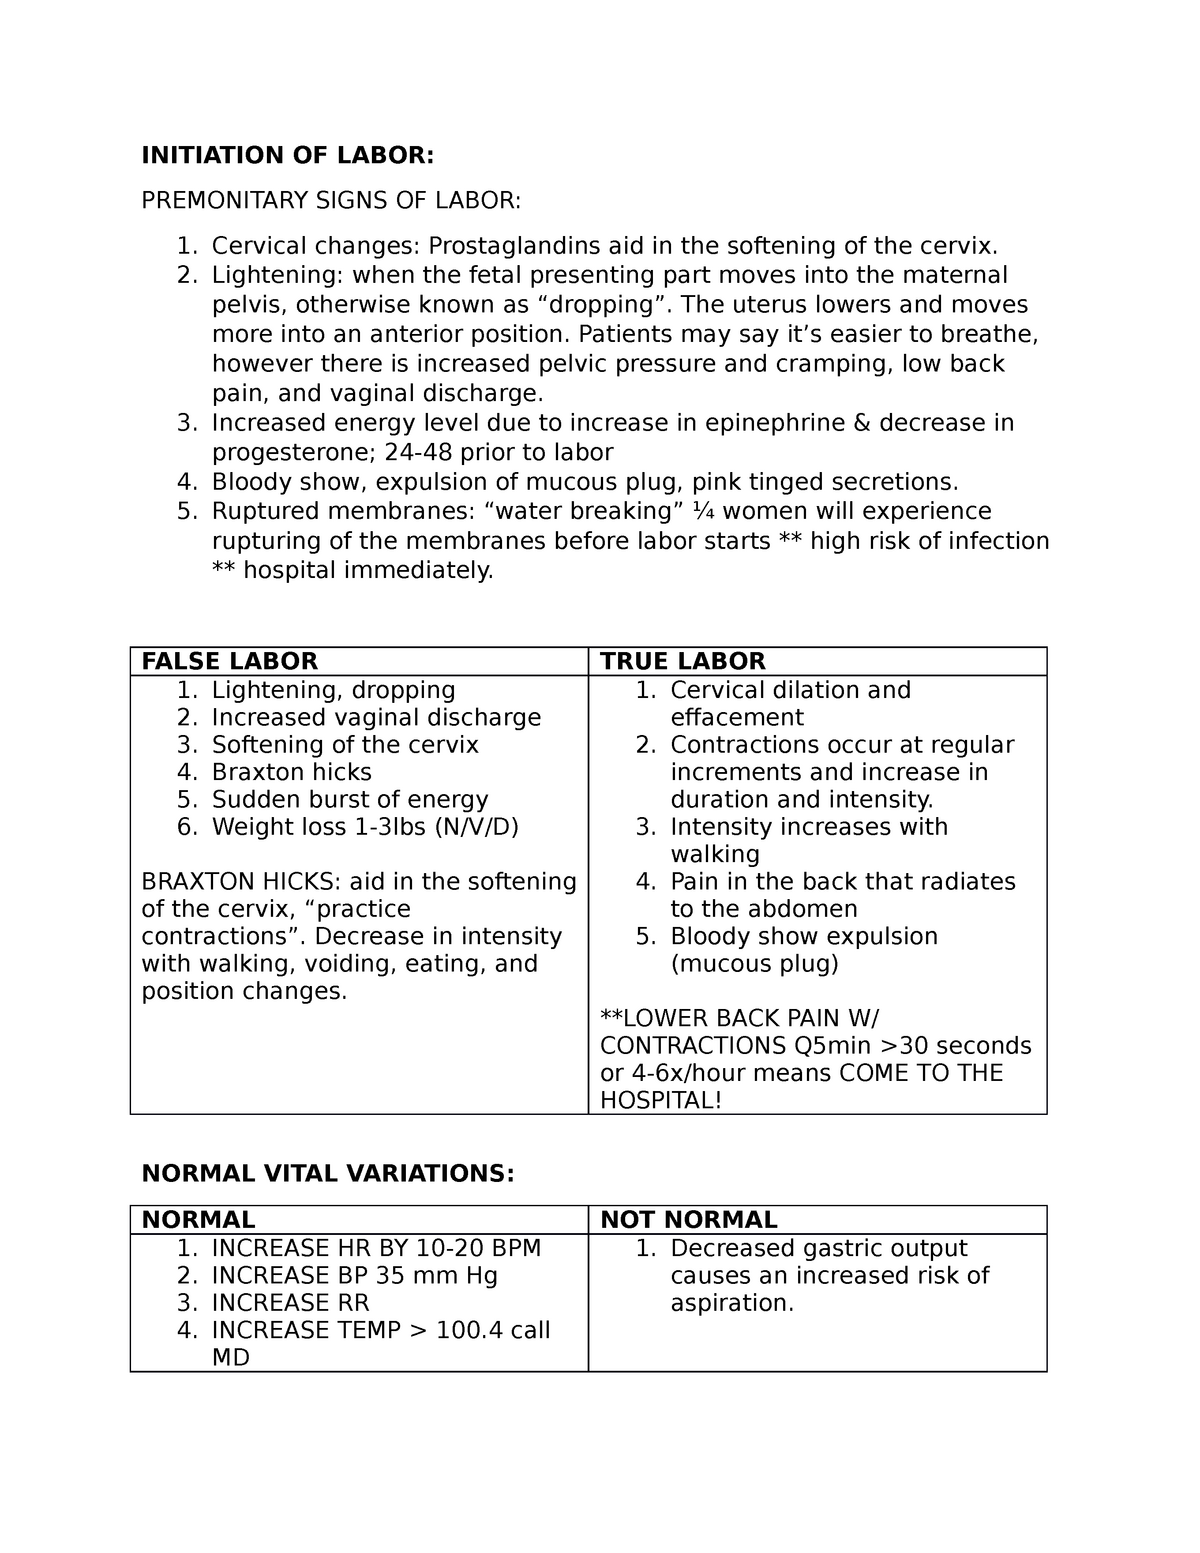 Initiation OF Labor - NURSU 454 Medical Surgical Nursing I